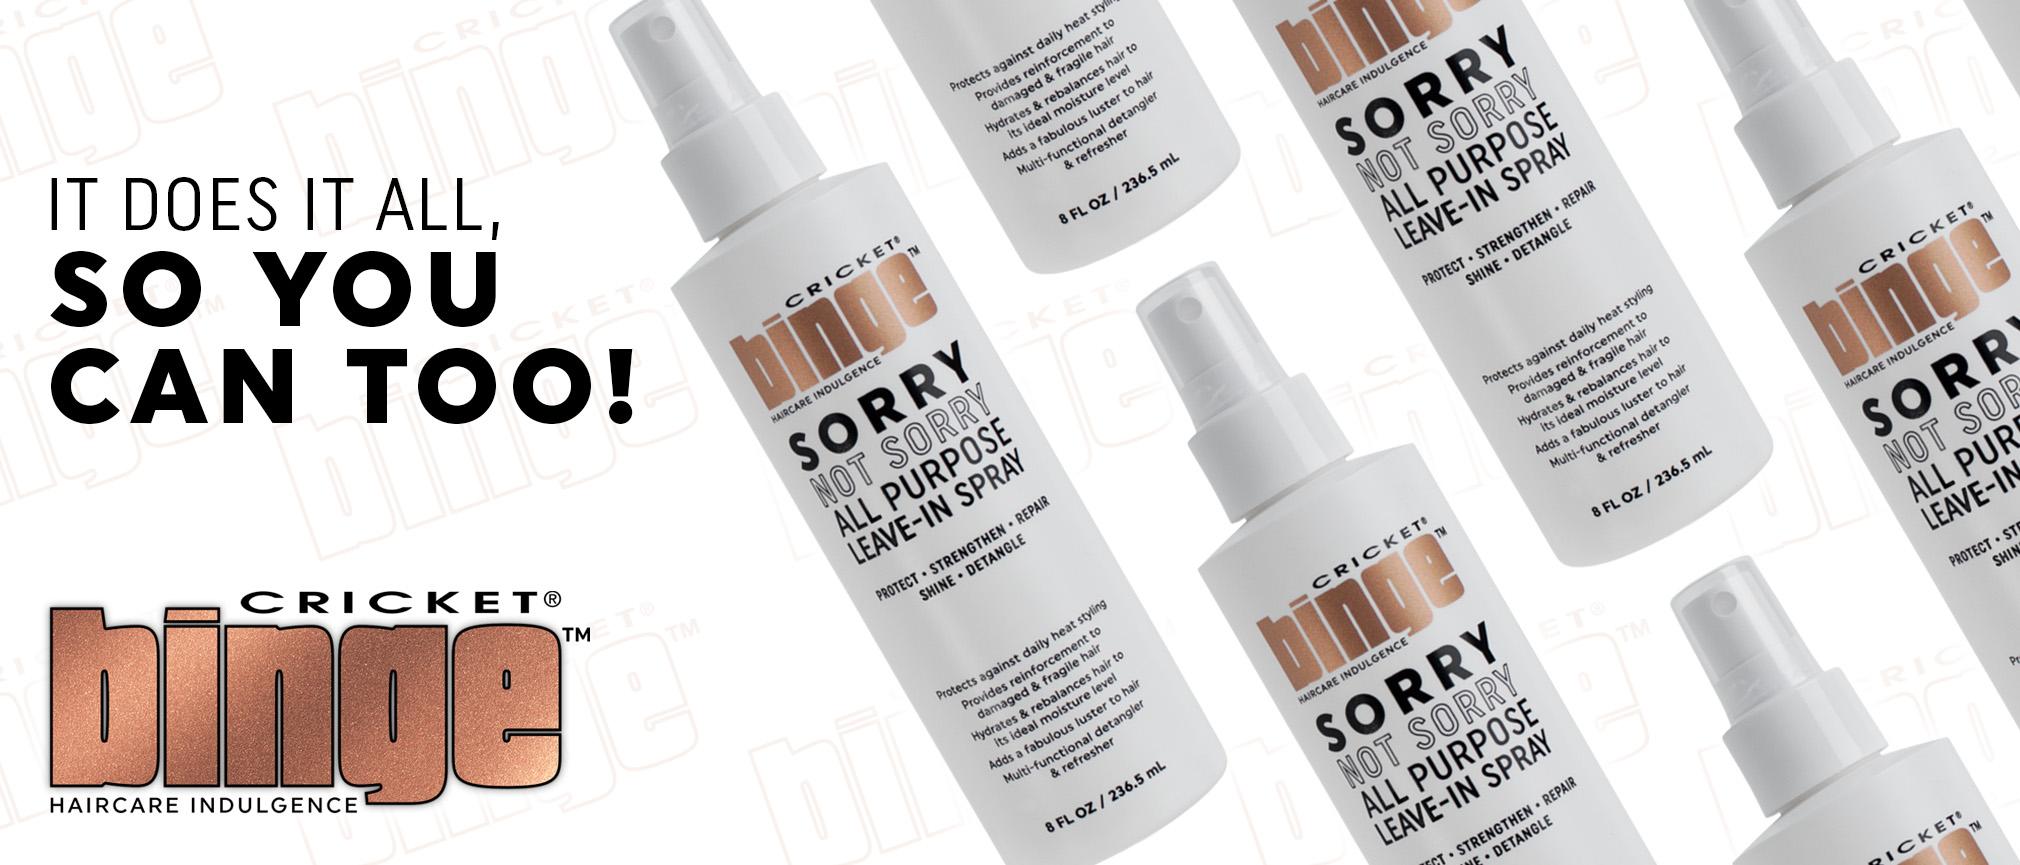 NEW Binge Sorry Not Sorry All Purpose Spray